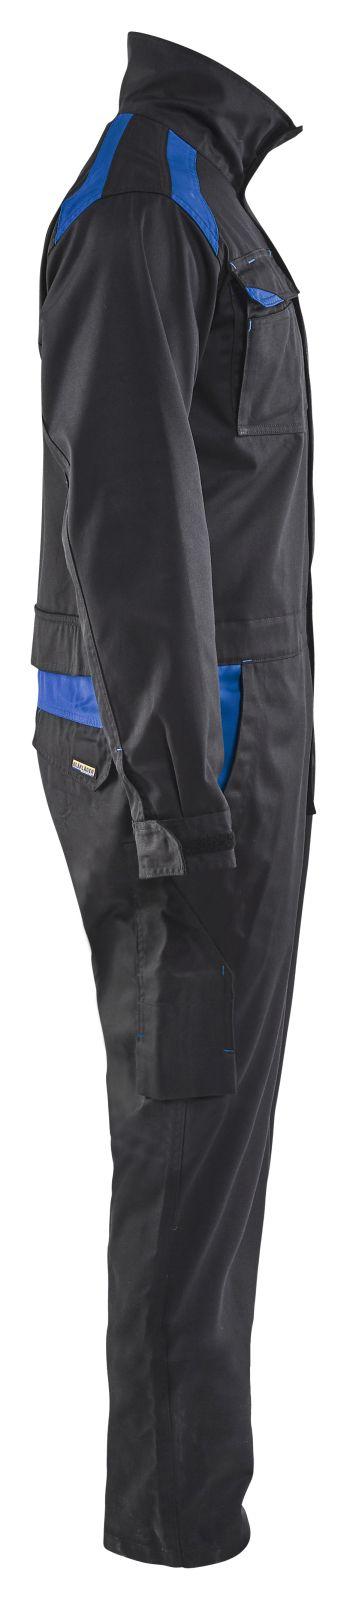 Blaklader Overalls 60541800 zwart-korenblauw(9985)